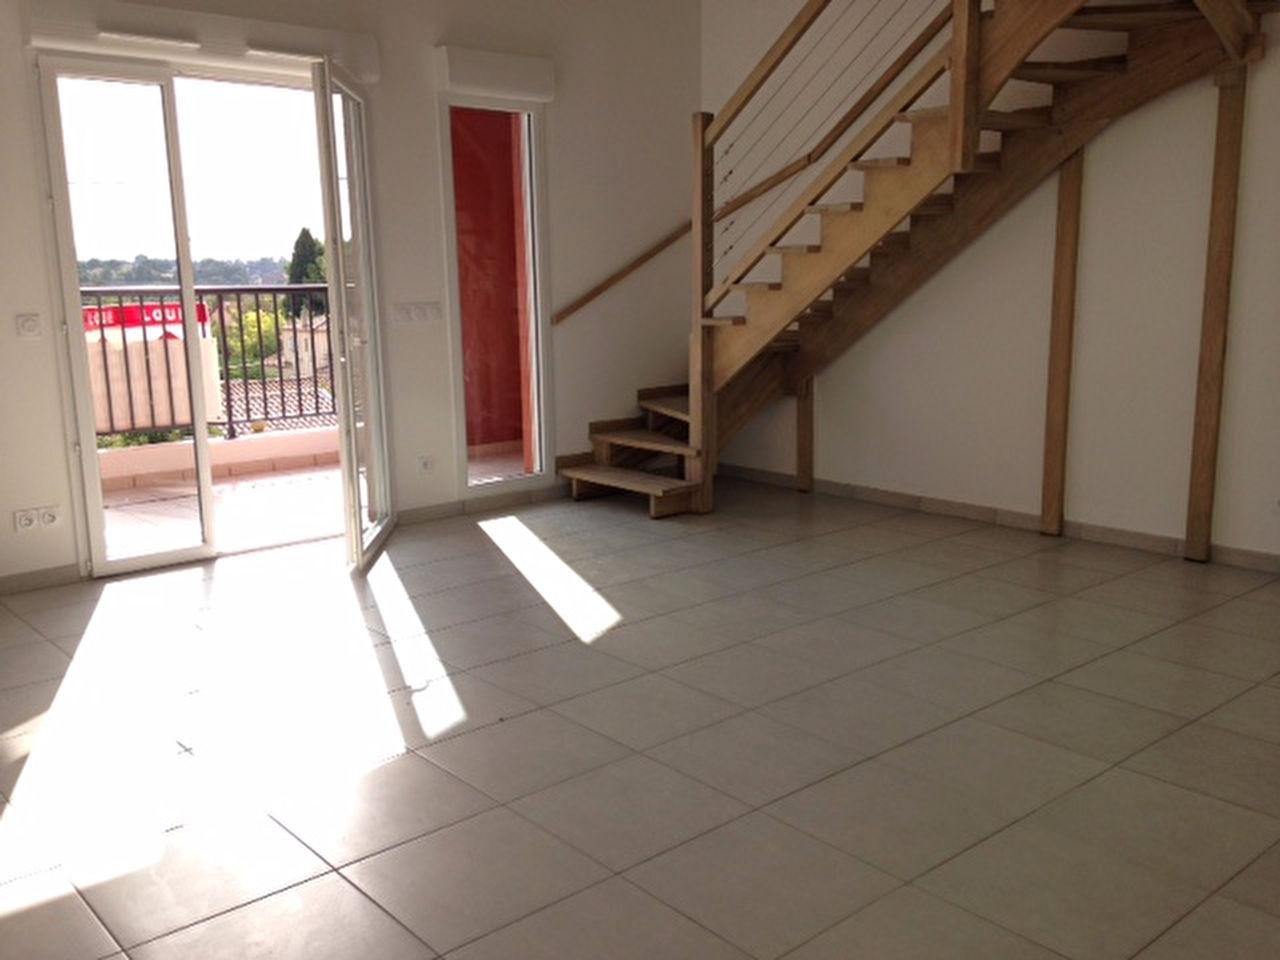 Immobilier allauch a louer locati appartement allauch for Garage a louer marseille 13012